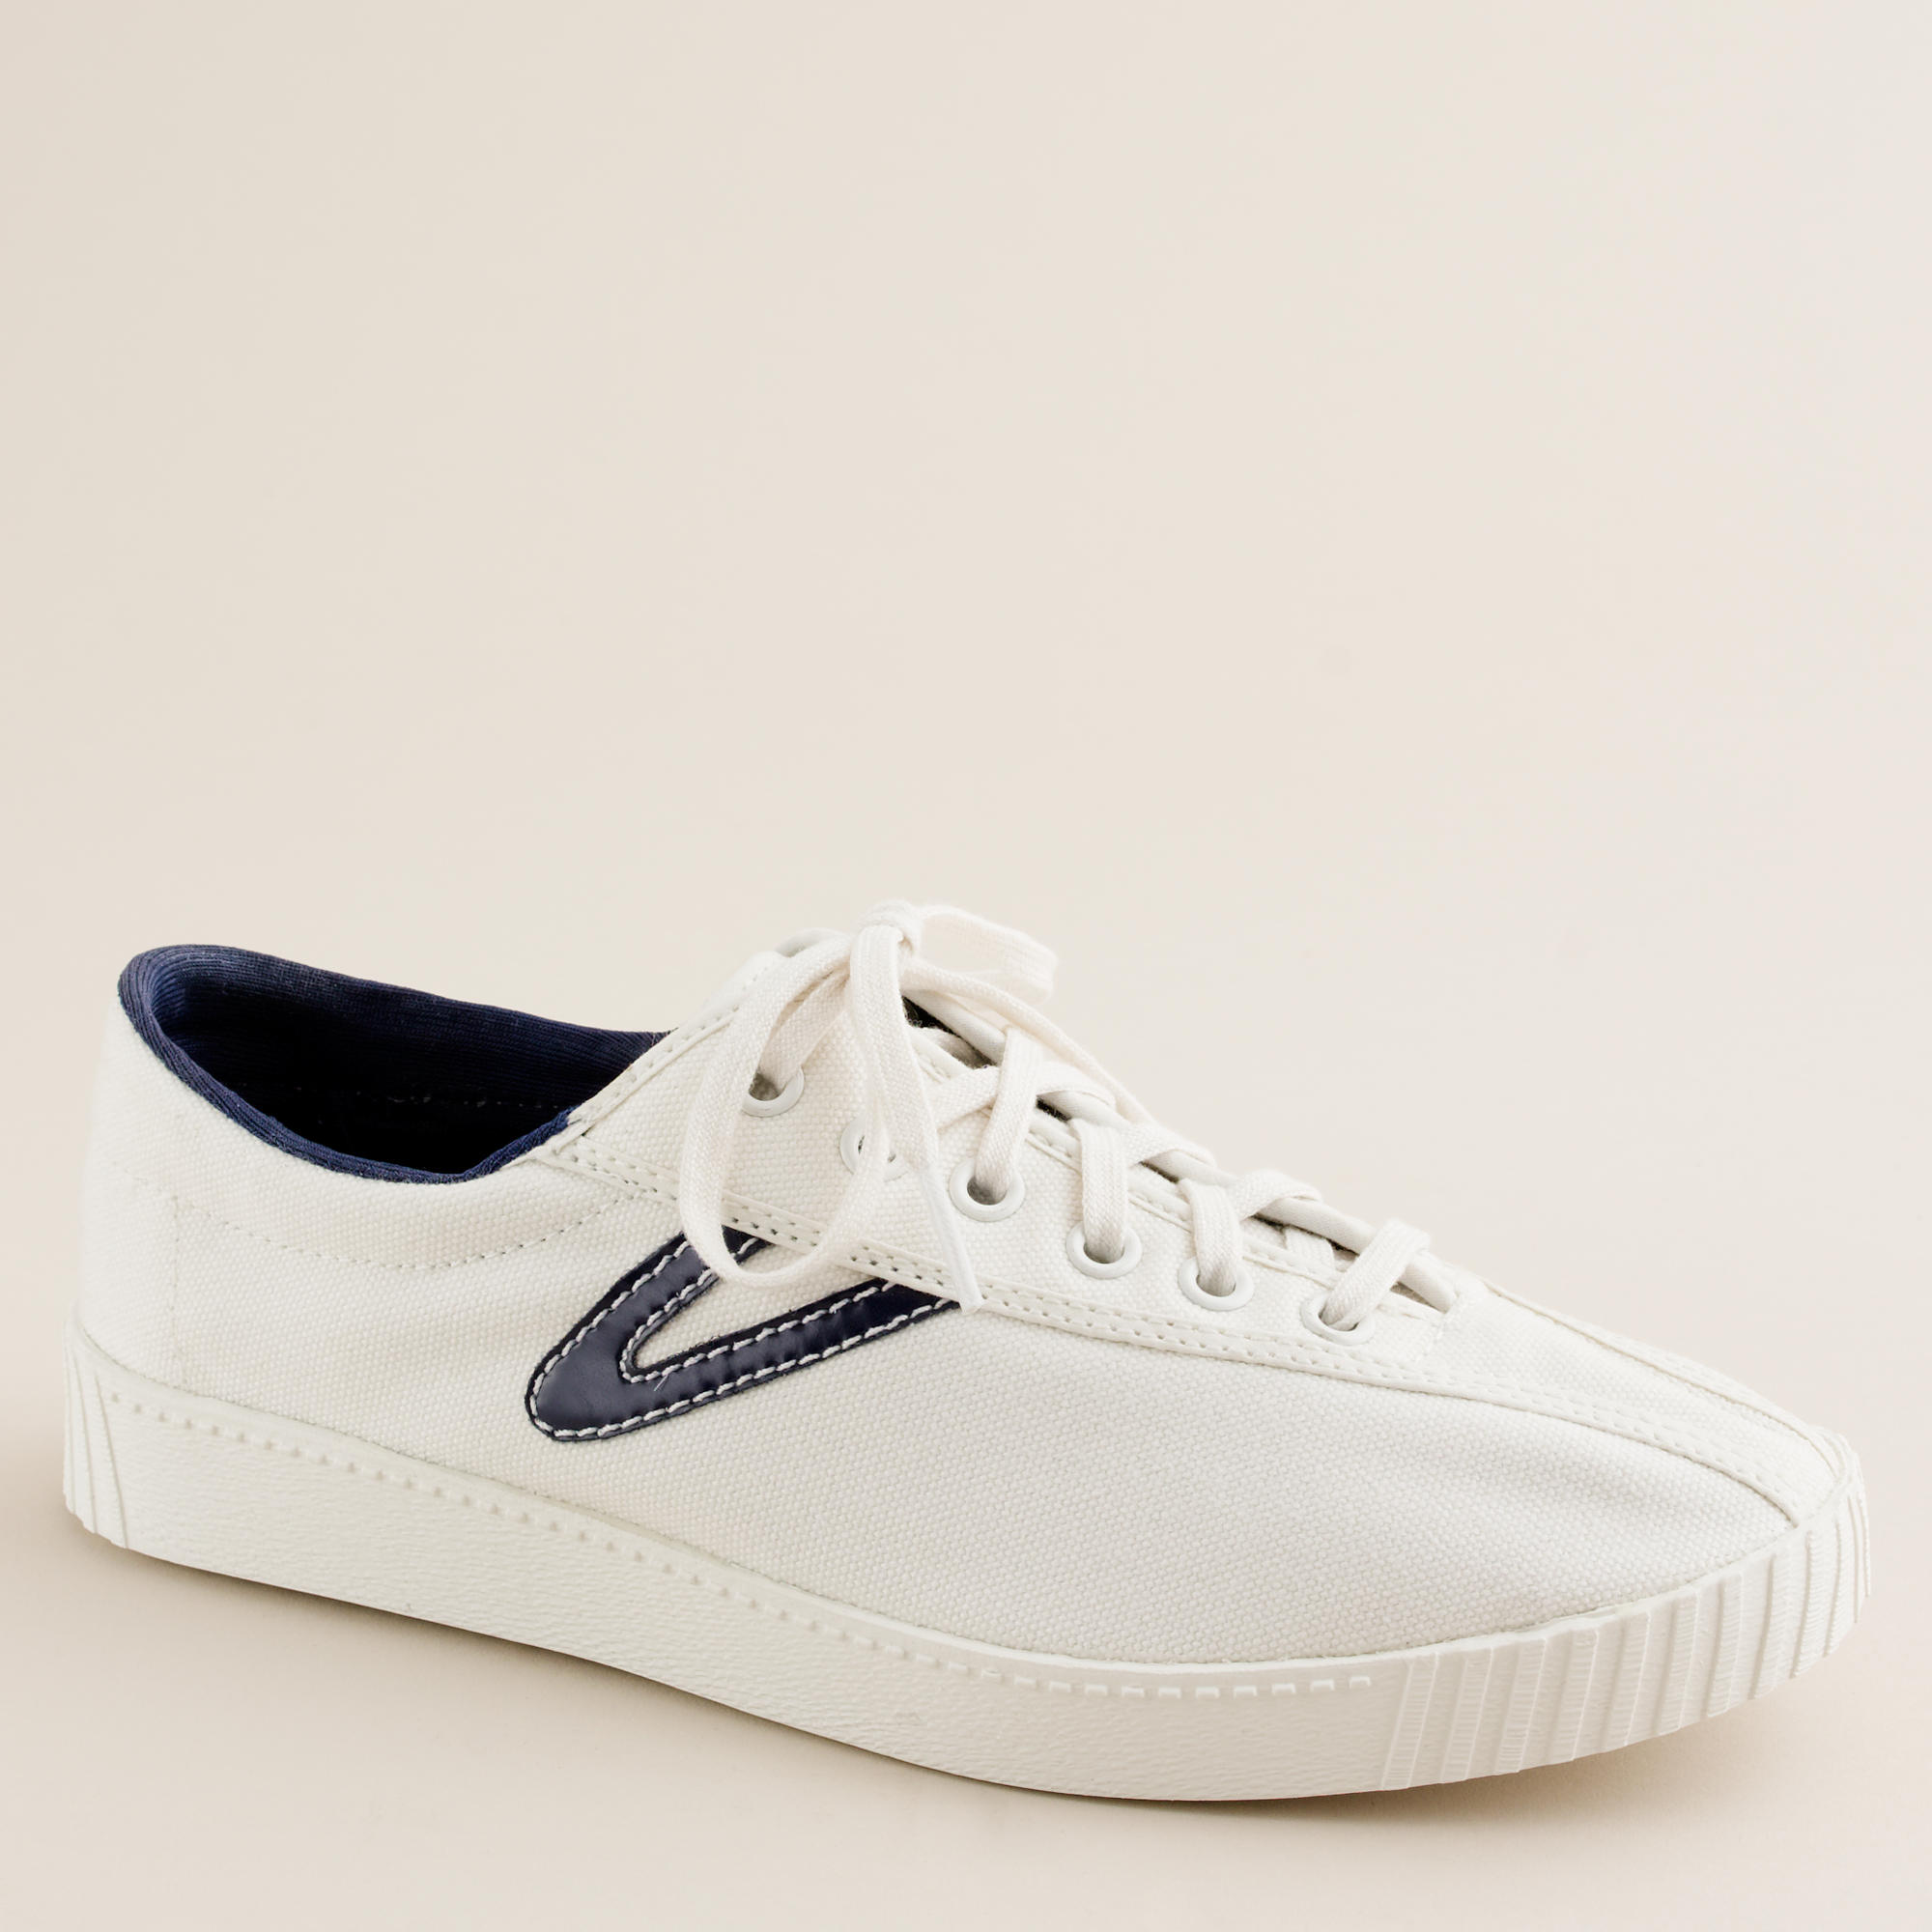 Tretorn Women S Shoes